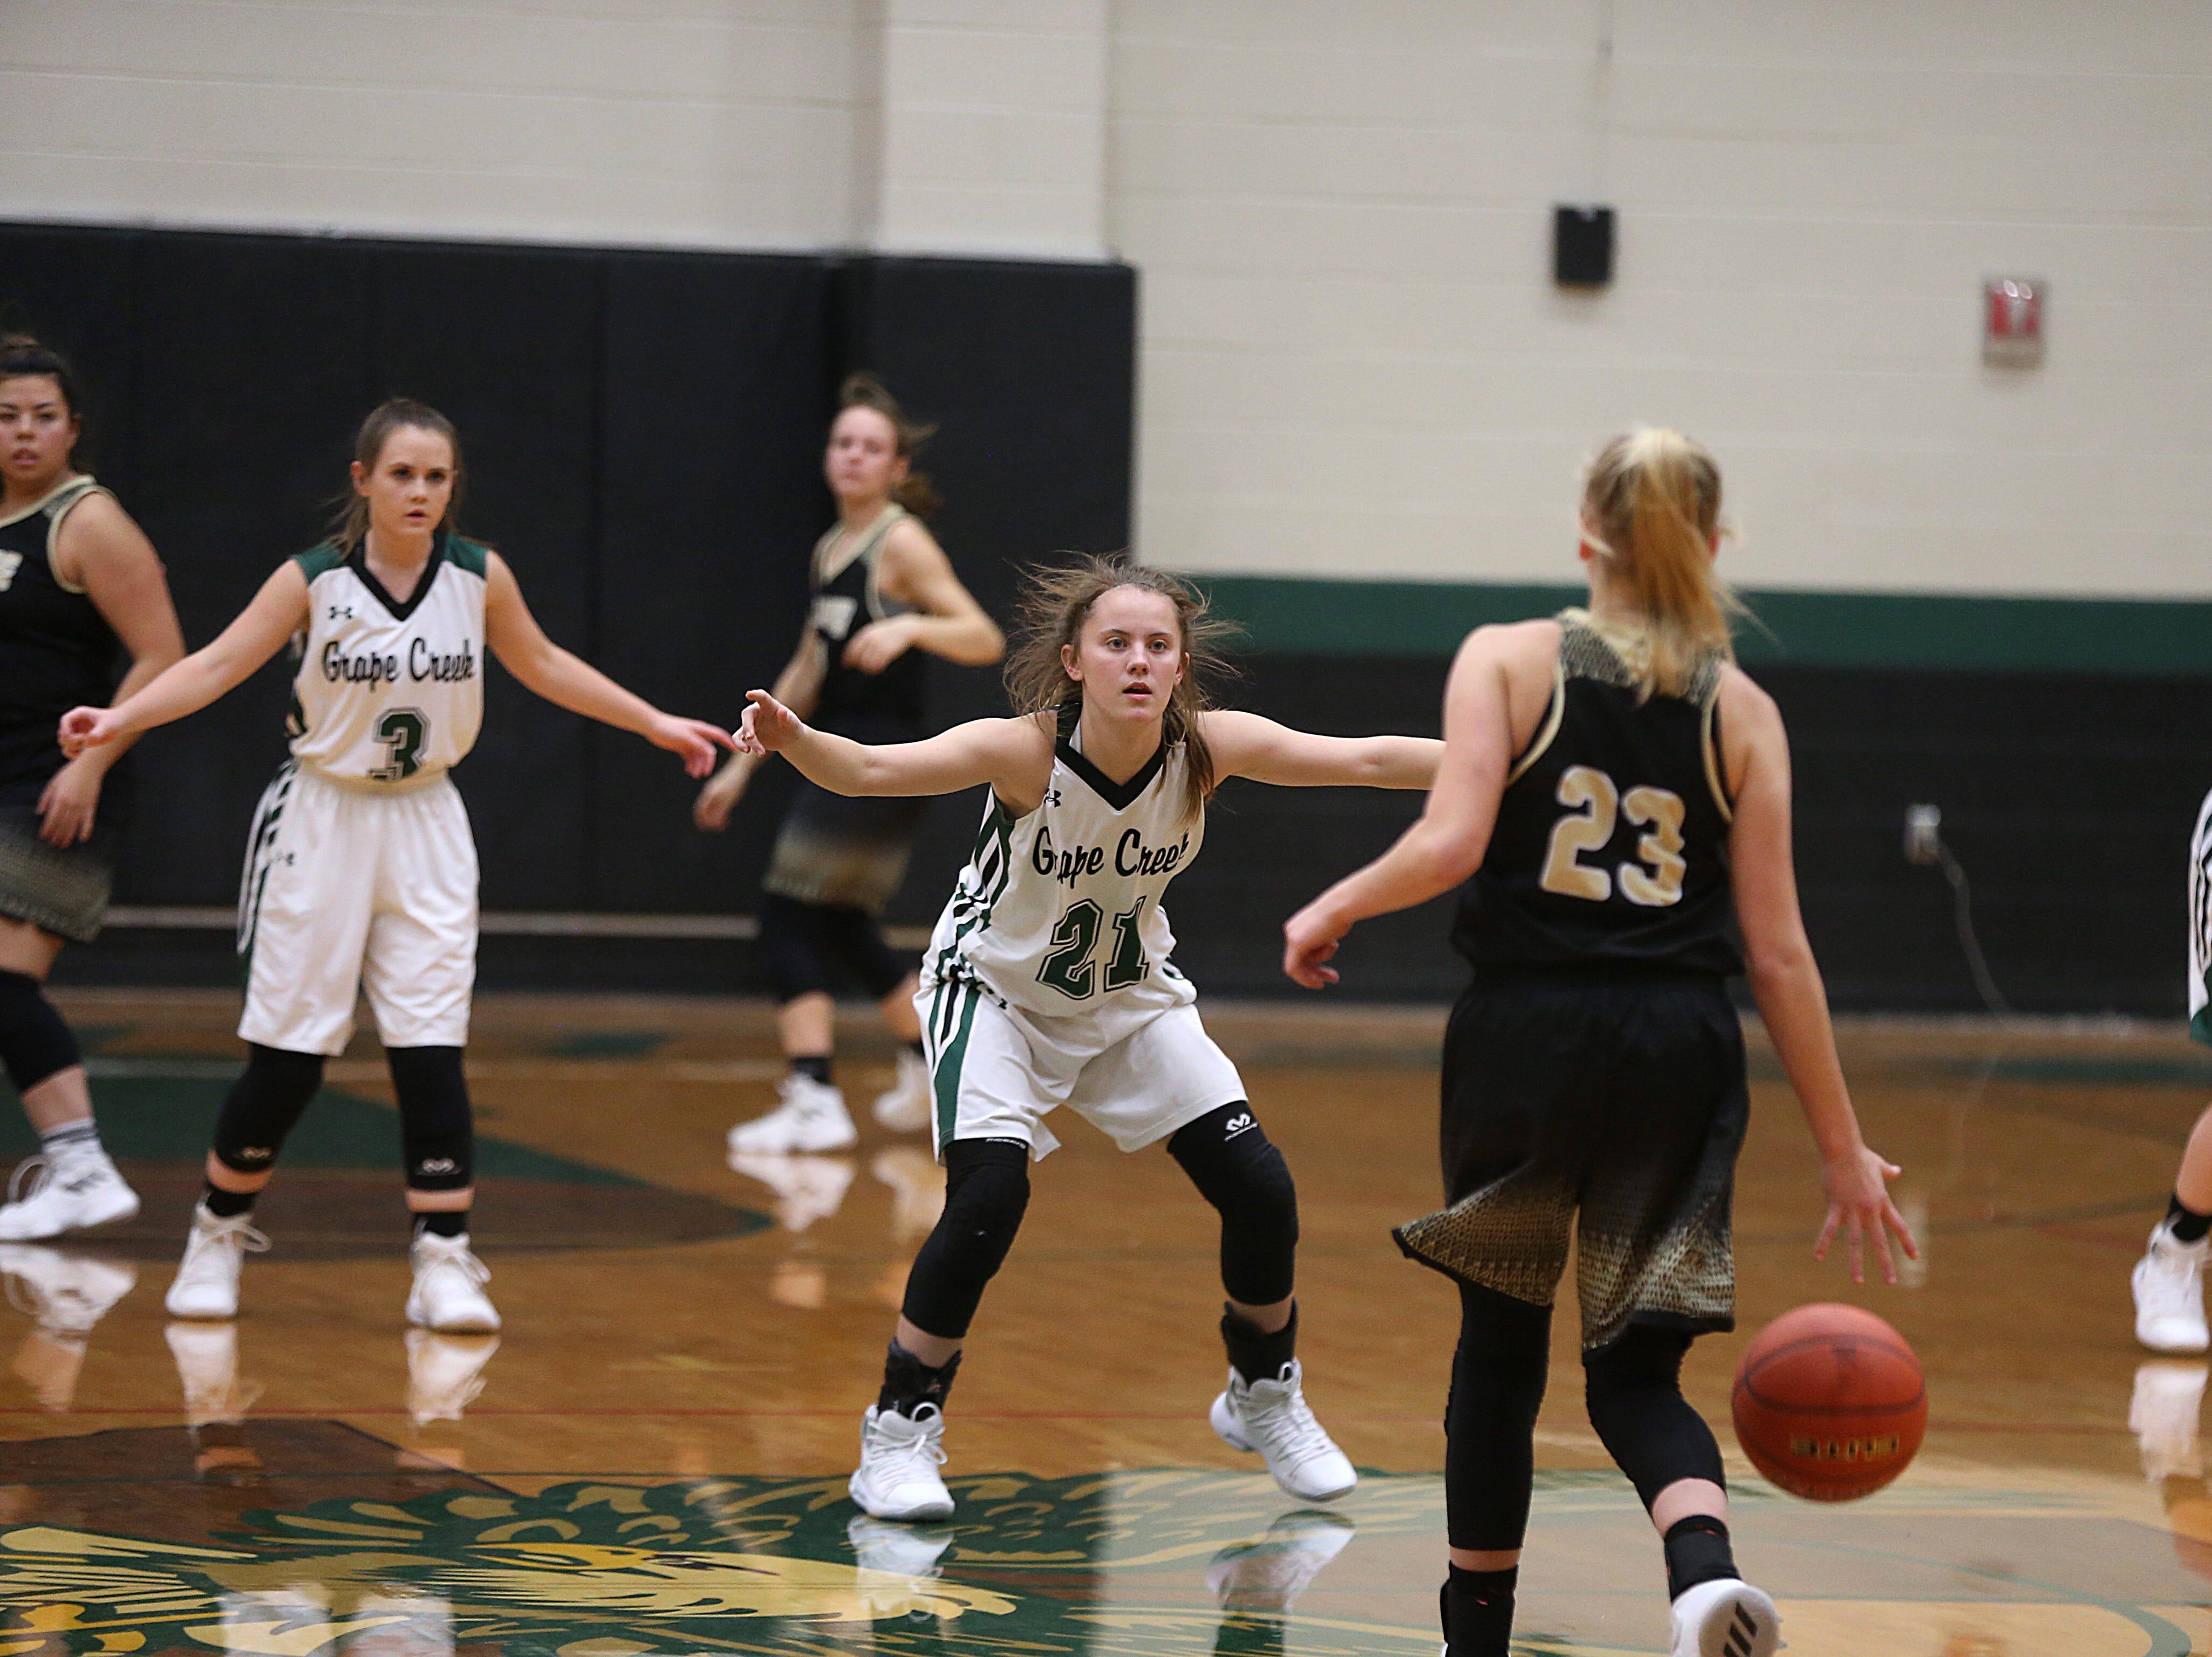 Grape Creek's Kimmy Salisbury (#21) blocks Brady's Savanna Morton (#23) as she heads to the basket Friday, Dec. 14, 2018 during their game in Grape Creek. Brady won 48 to 28.